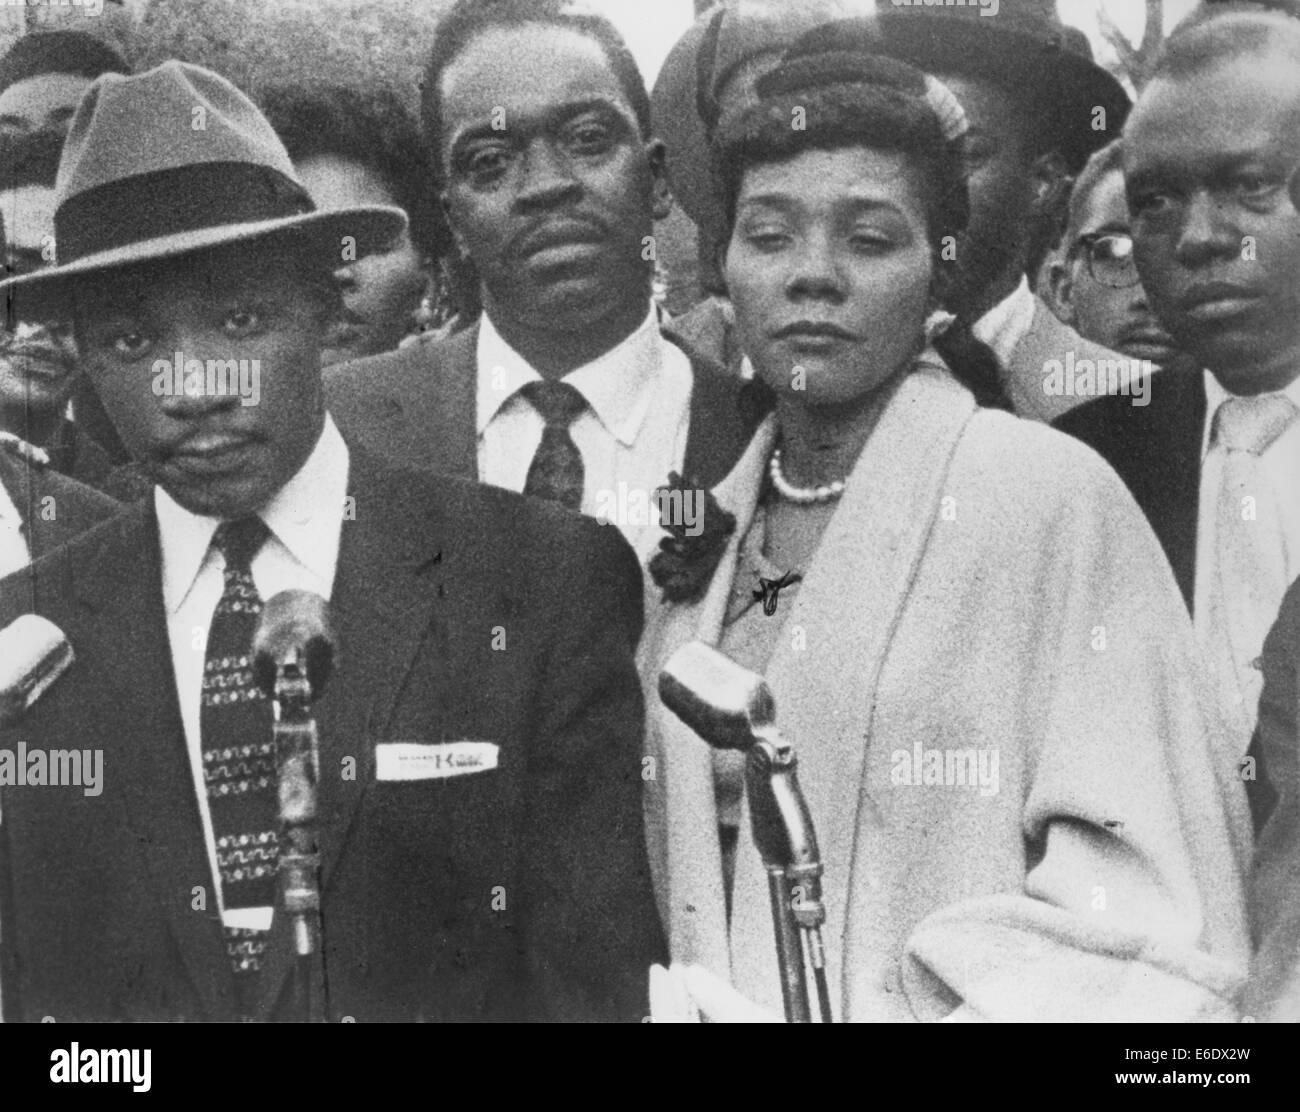 Martin Luther King, Jr. mit Ehefrau Coretta, während Bus-Boykott, Montgomery, Alabama, USA, März 1956 Stockfoto